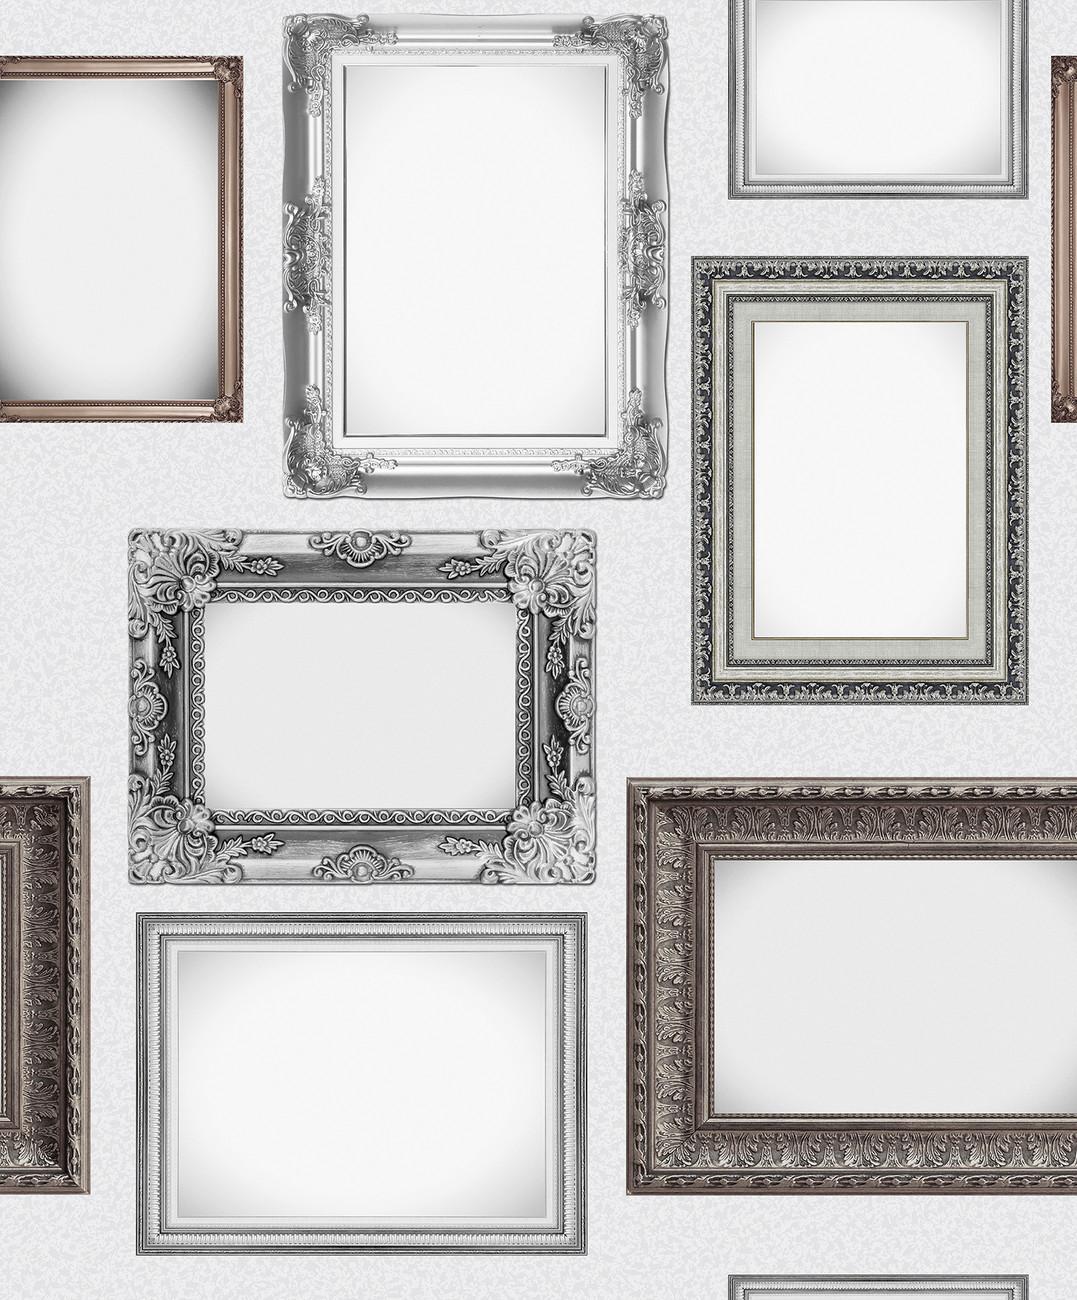 Fototapete, Tapete Rahmen bei EuroPosters - Kostenloser Versand